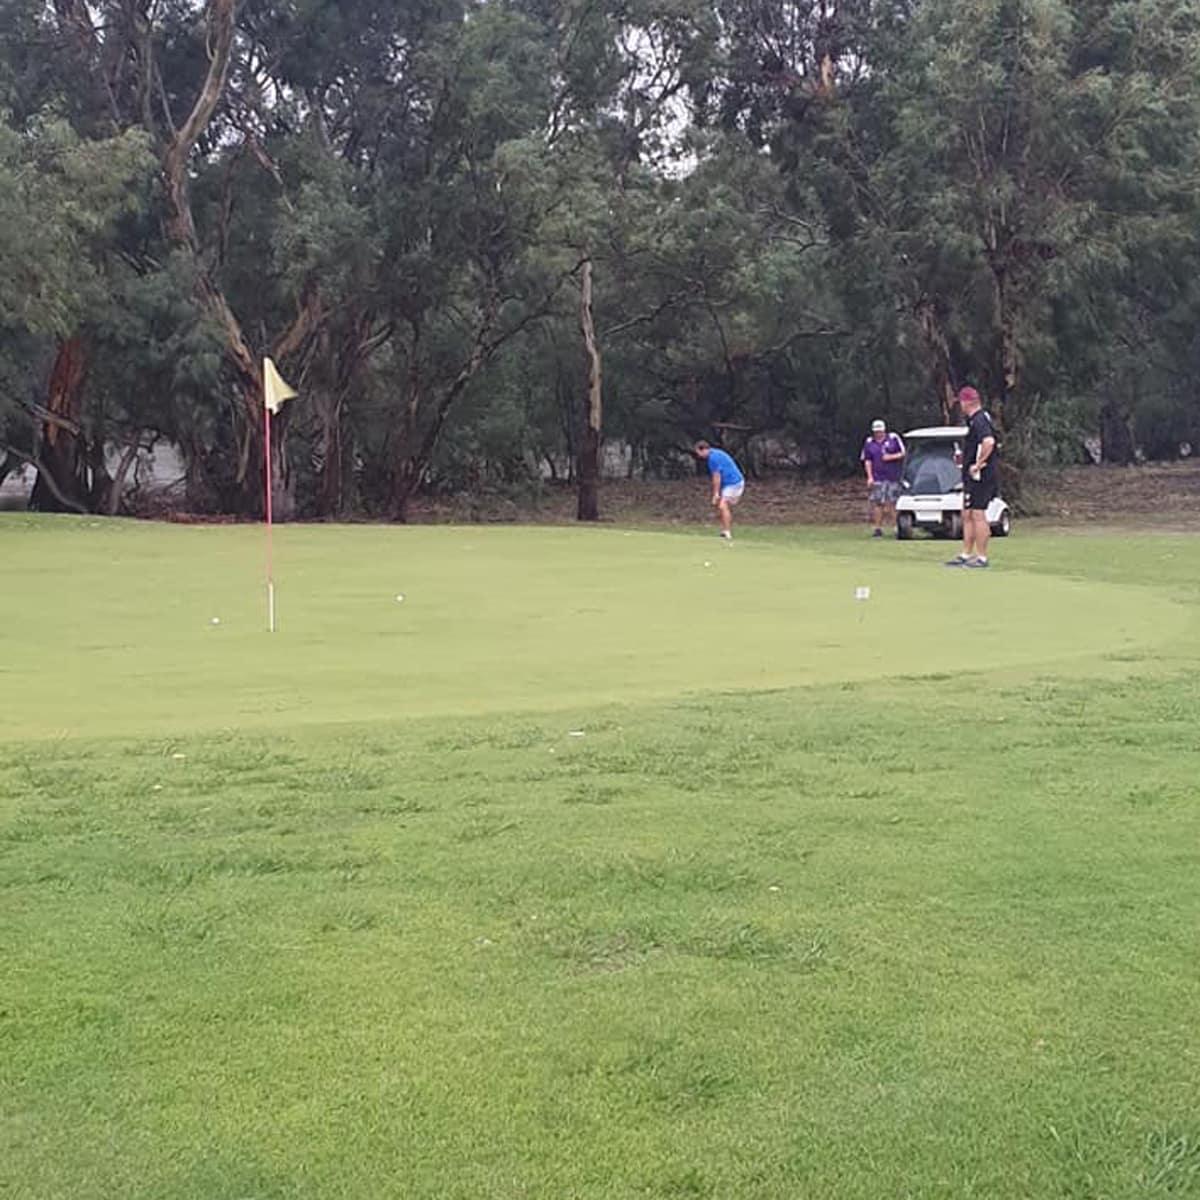 Putting green at Jerilderie Golf Club